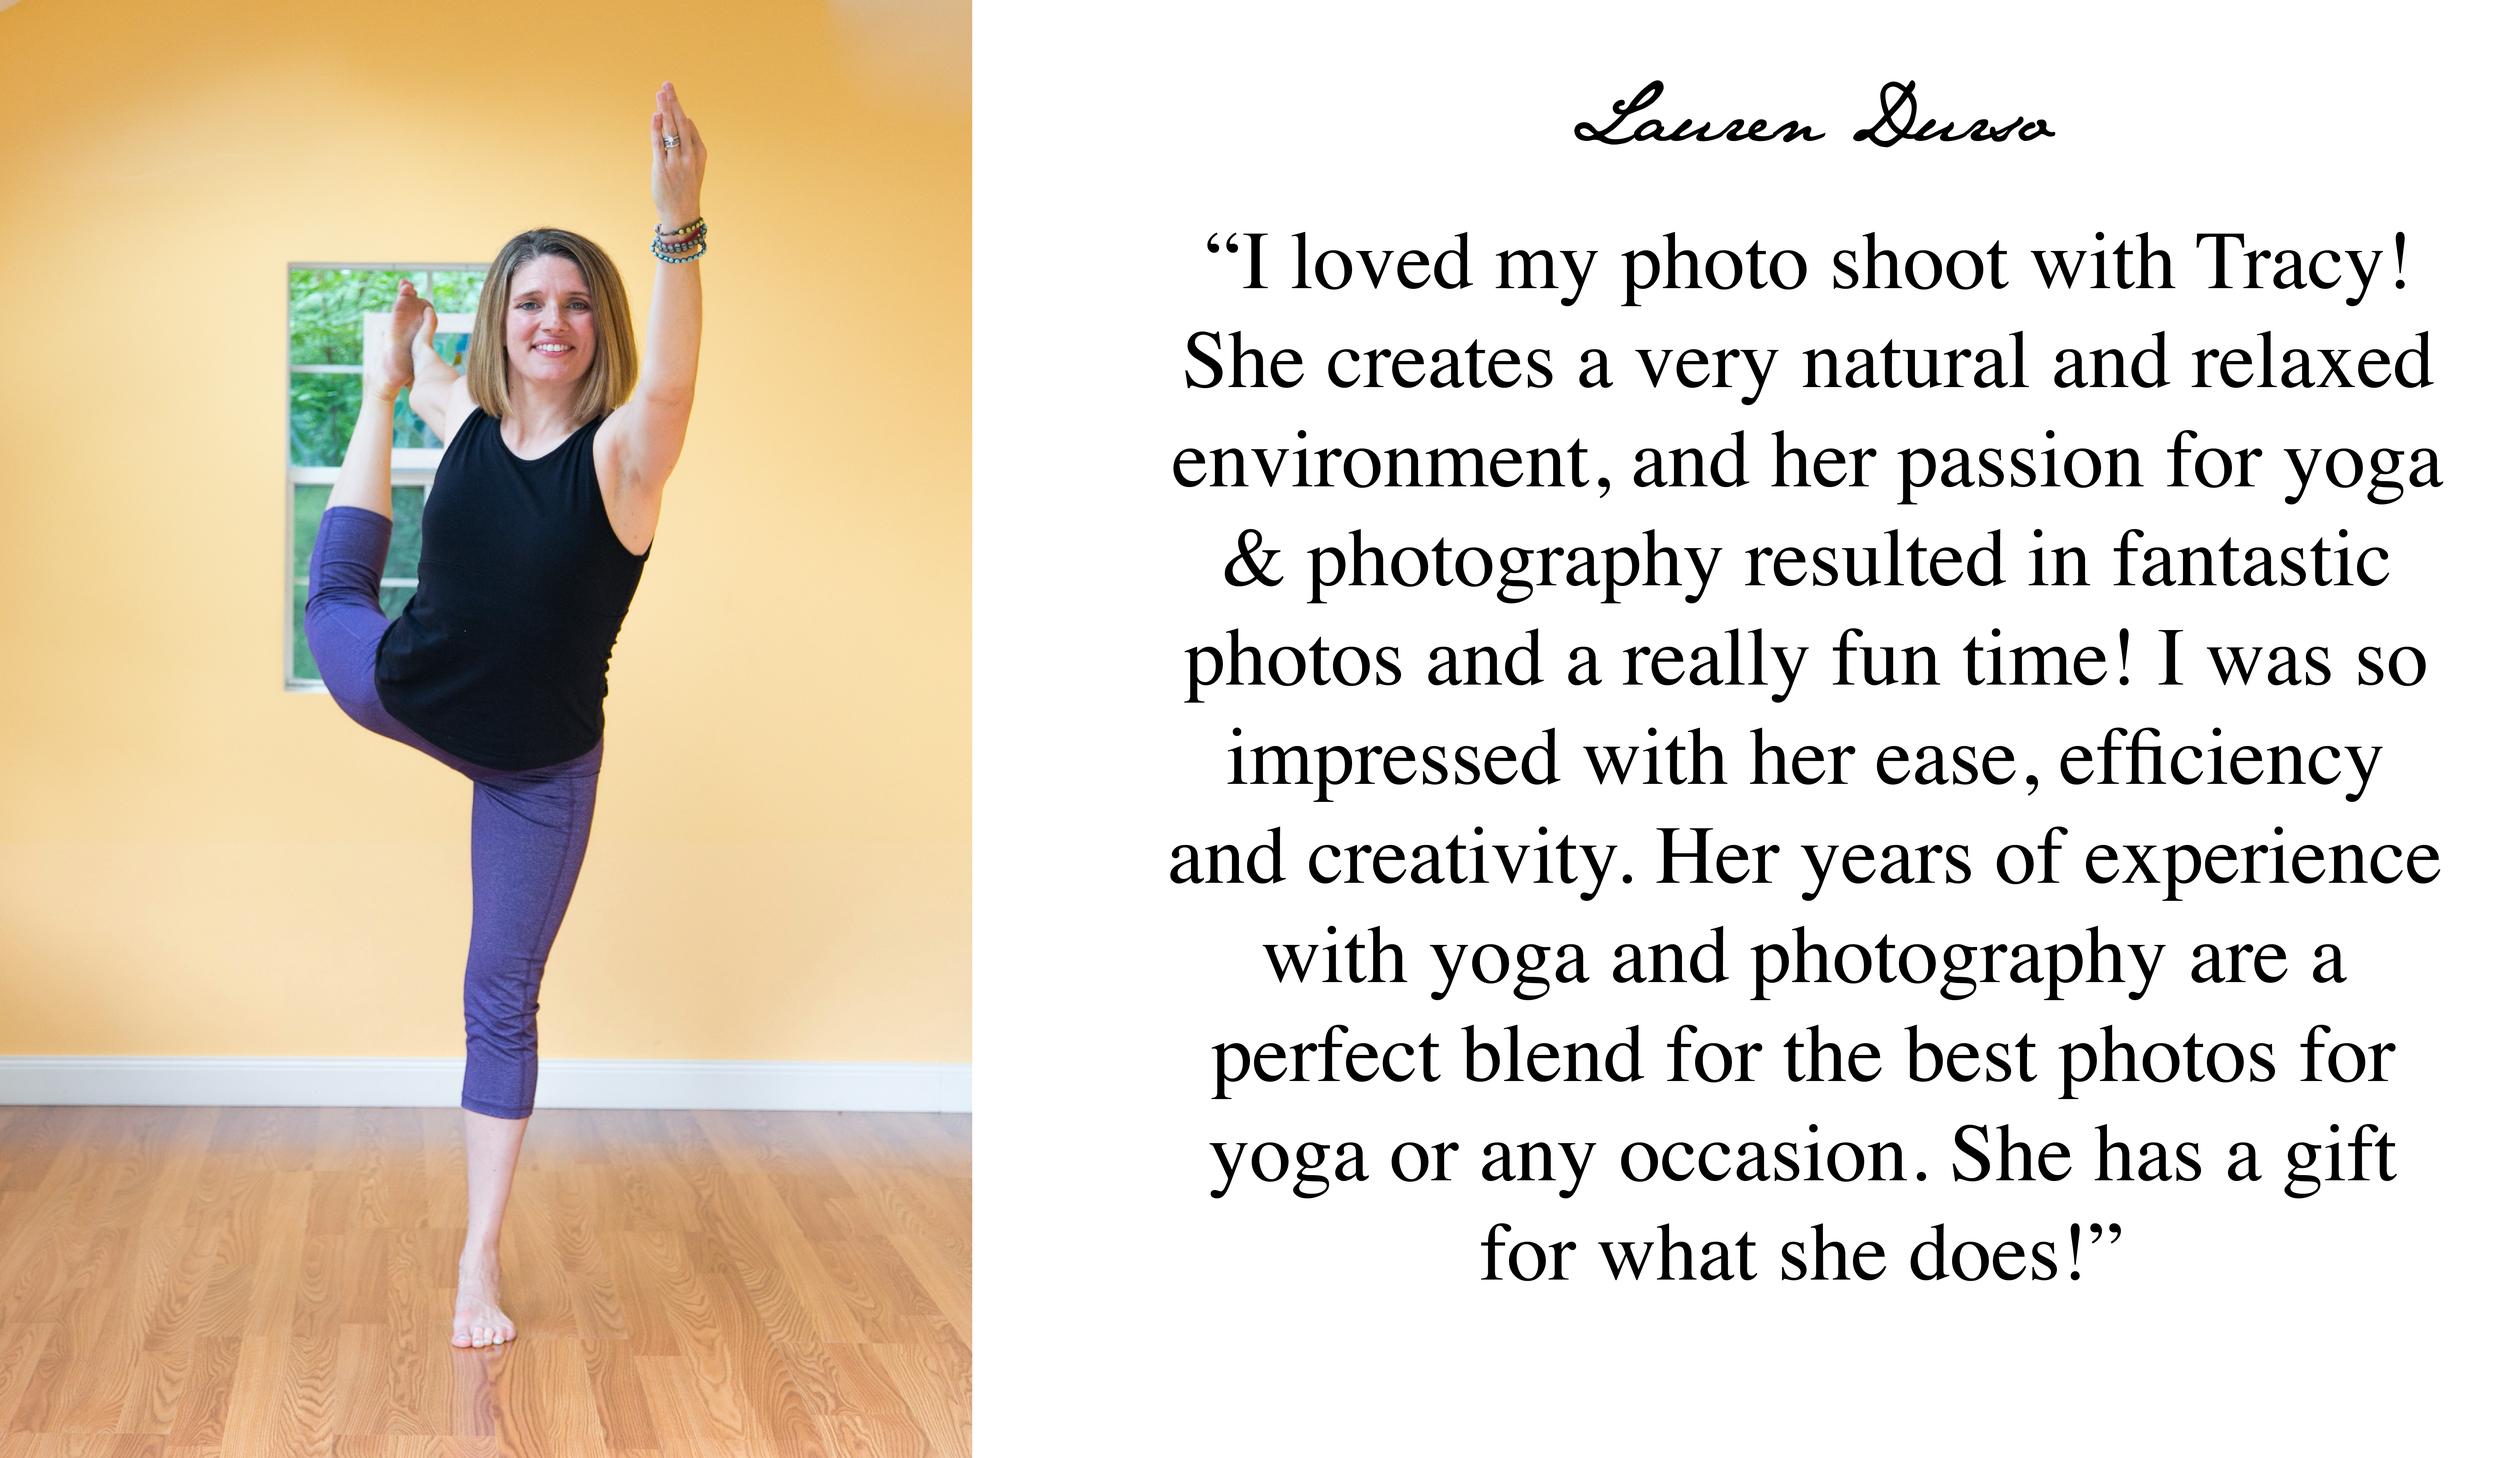 Boston Yoga Photographer 5 Star Review